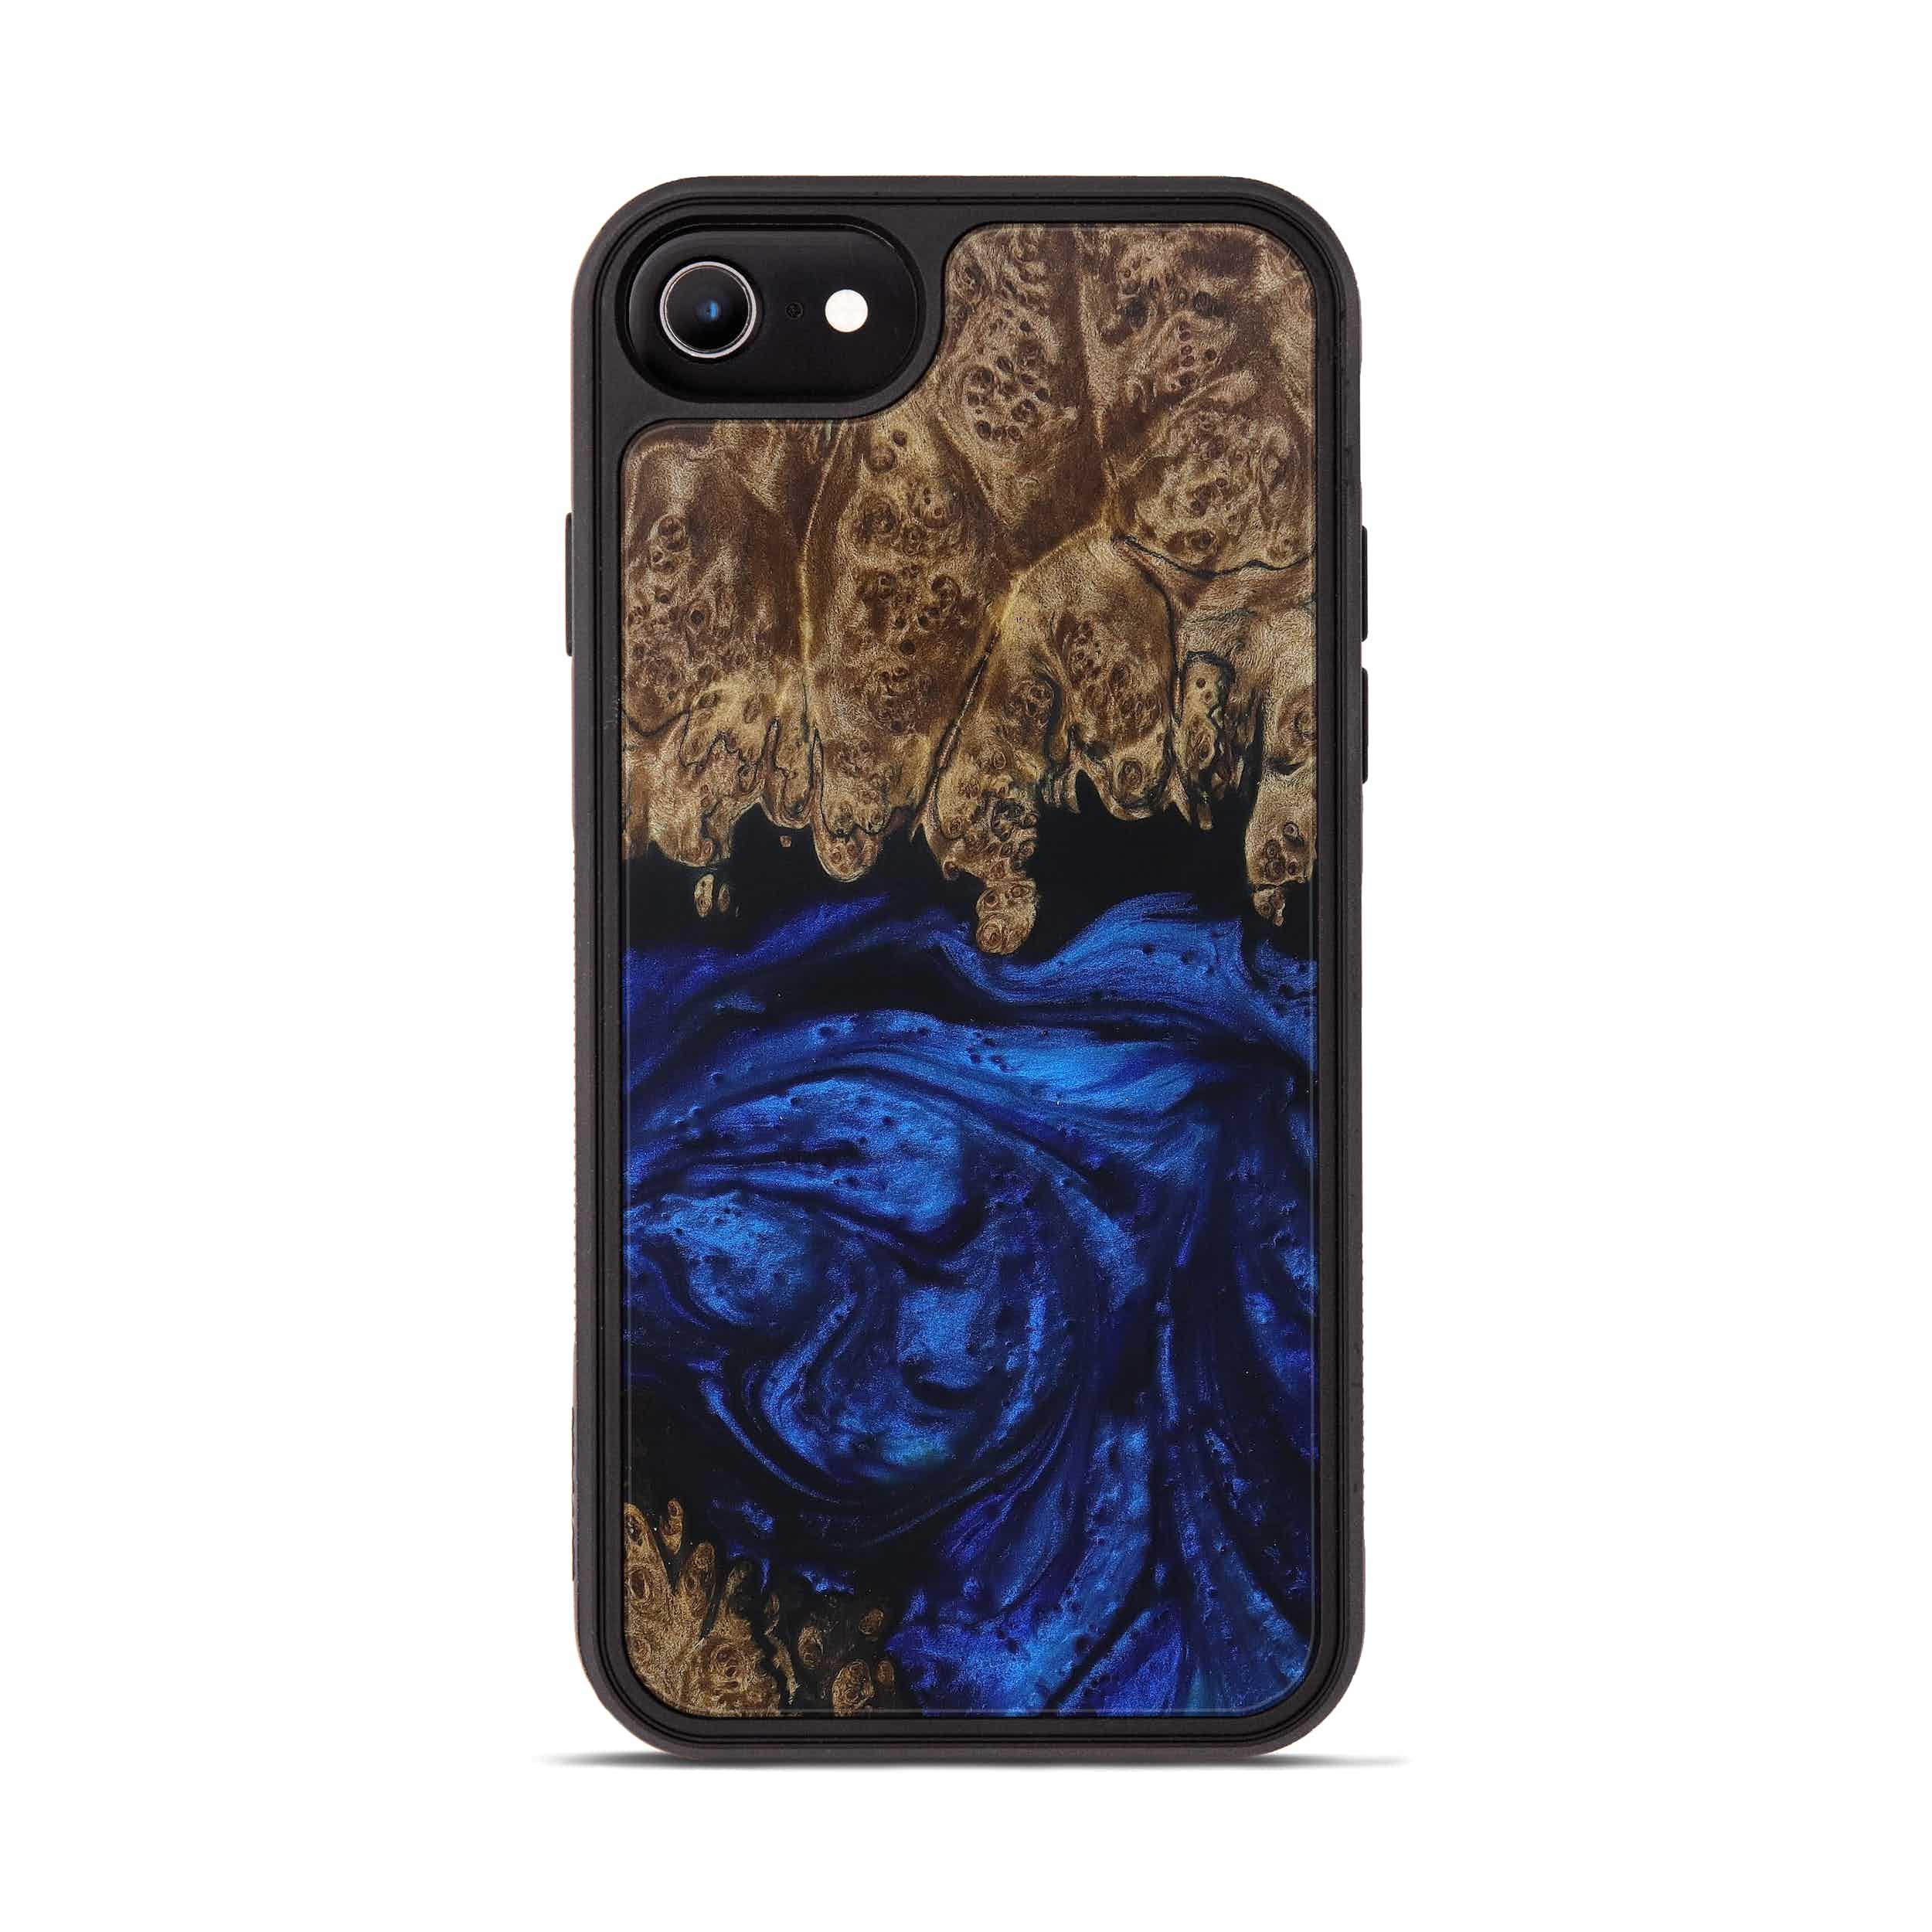 iPhone 7 Wood+Resin Phone Case - Shyoko (Dark Blue, 399849)